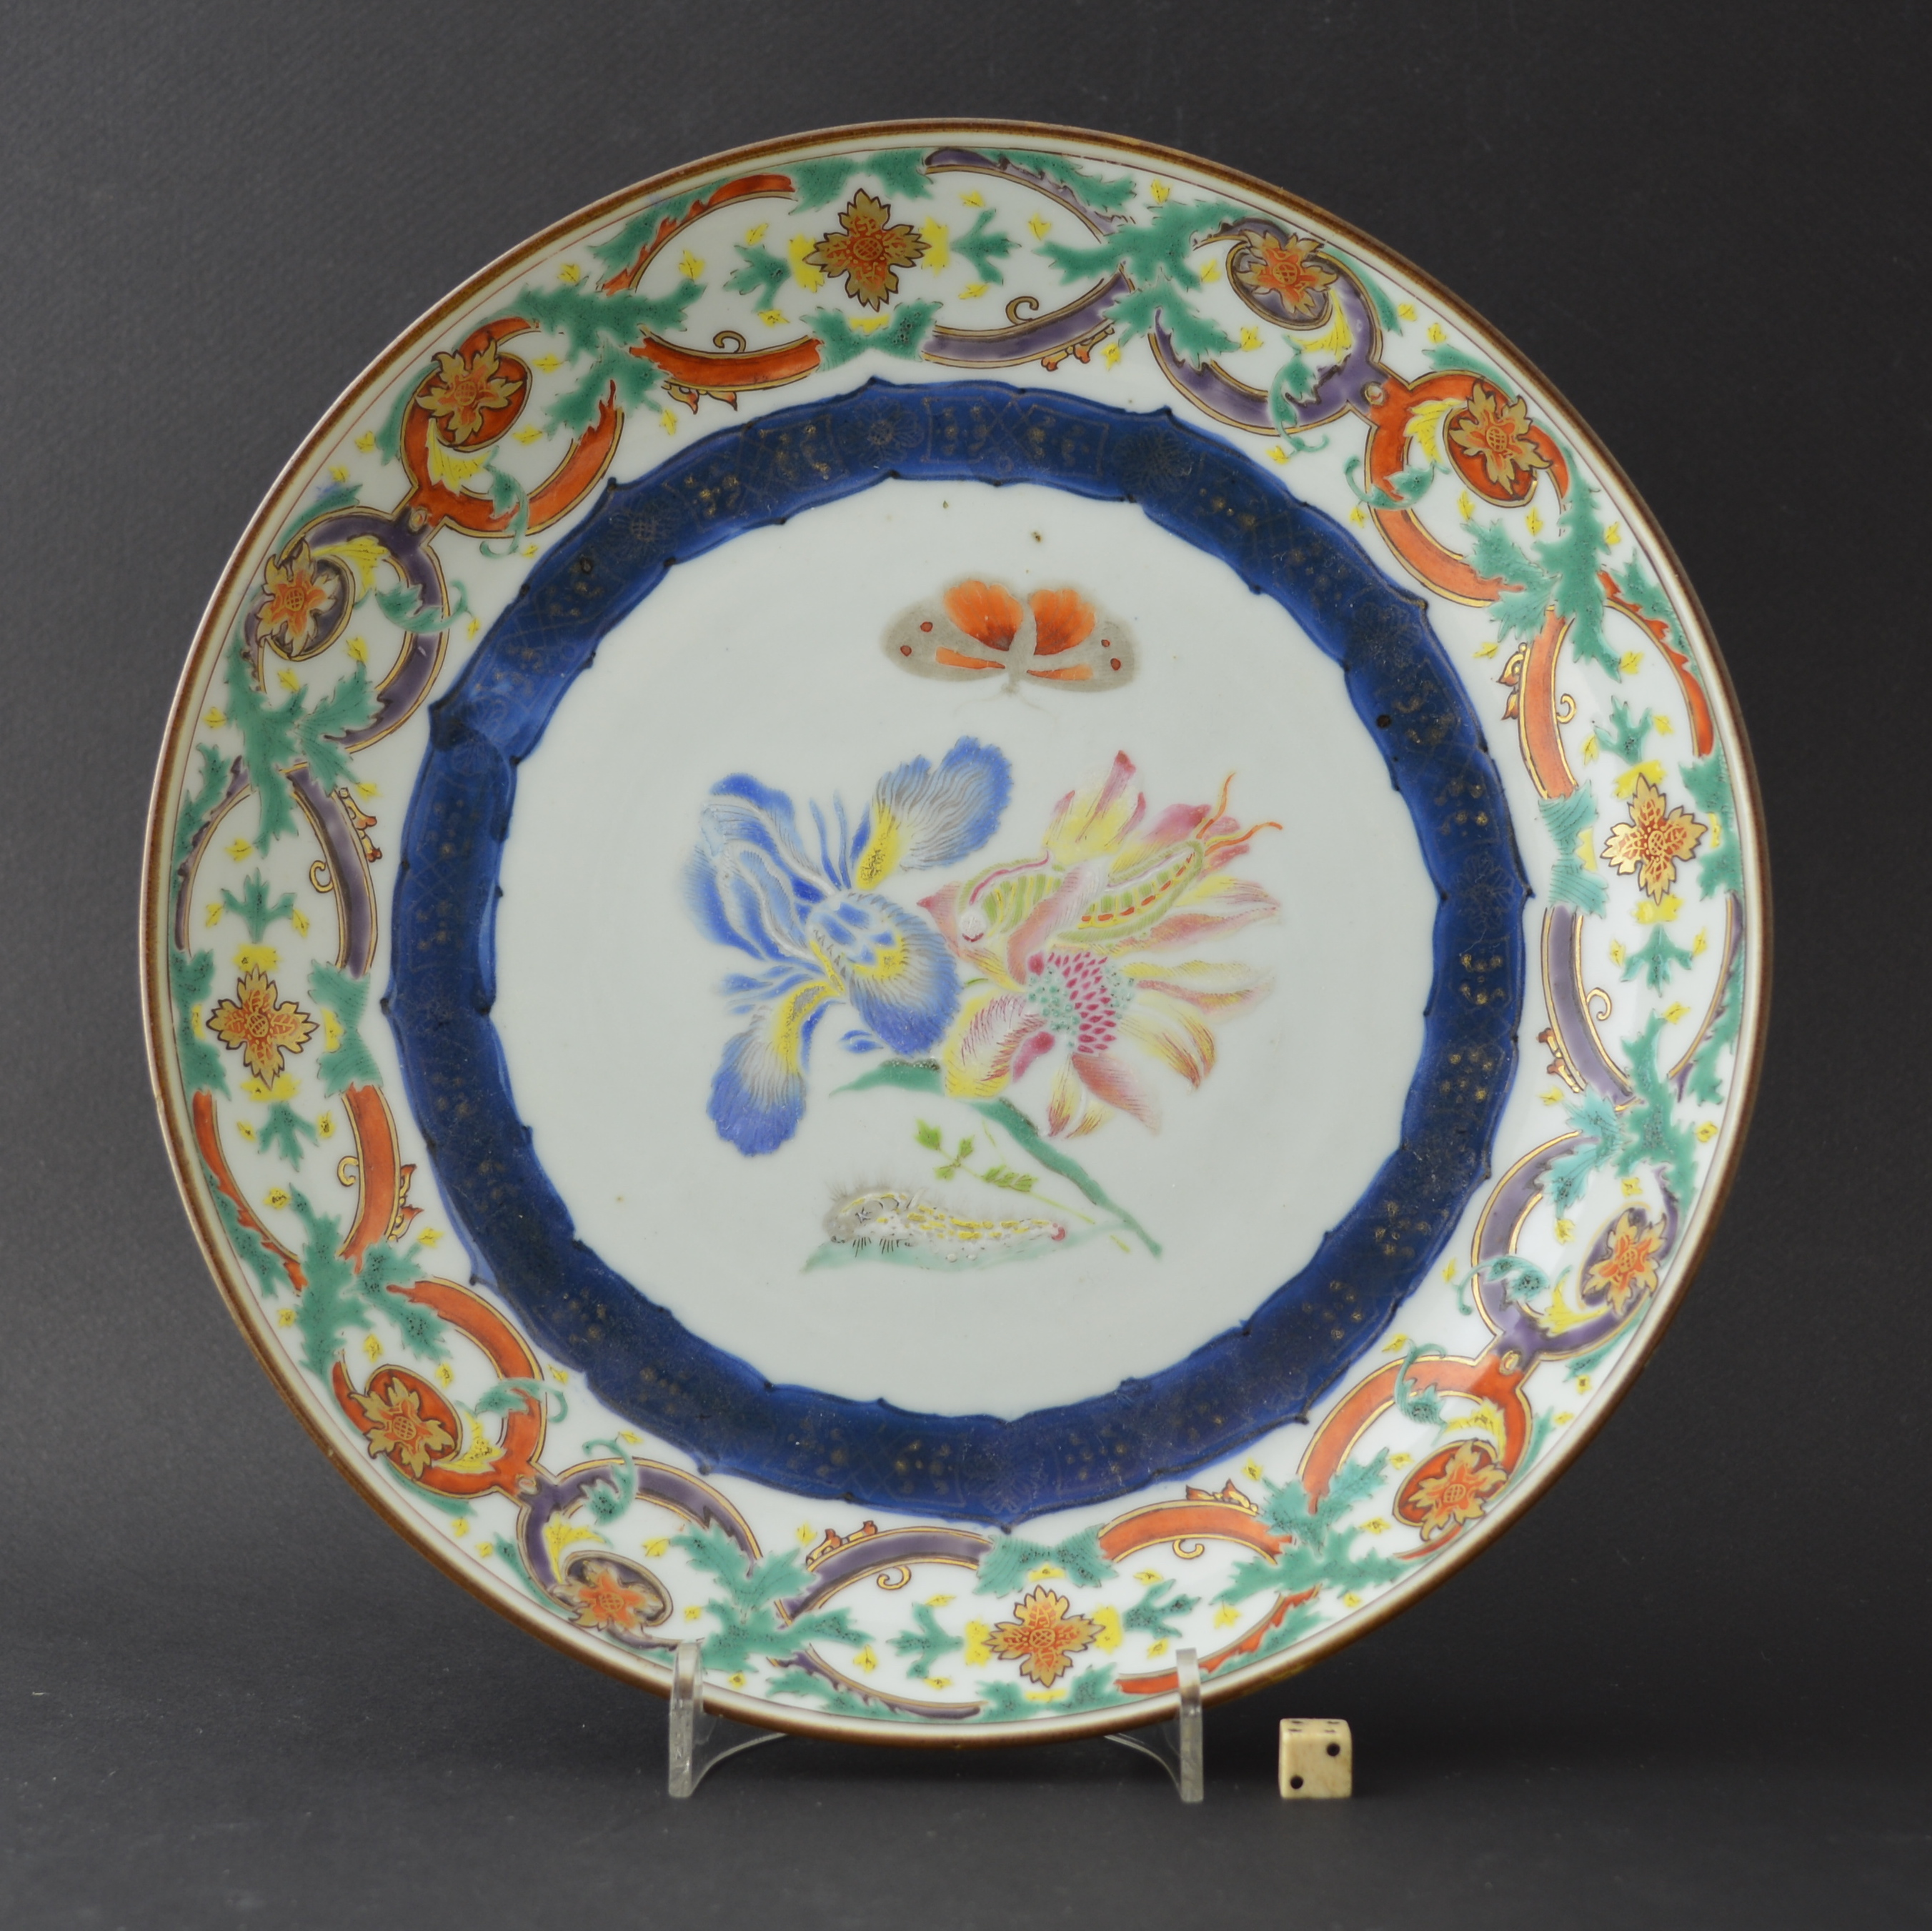 Chinese Export Porcelain Botanical `Merian` Plate c.1740-1750.